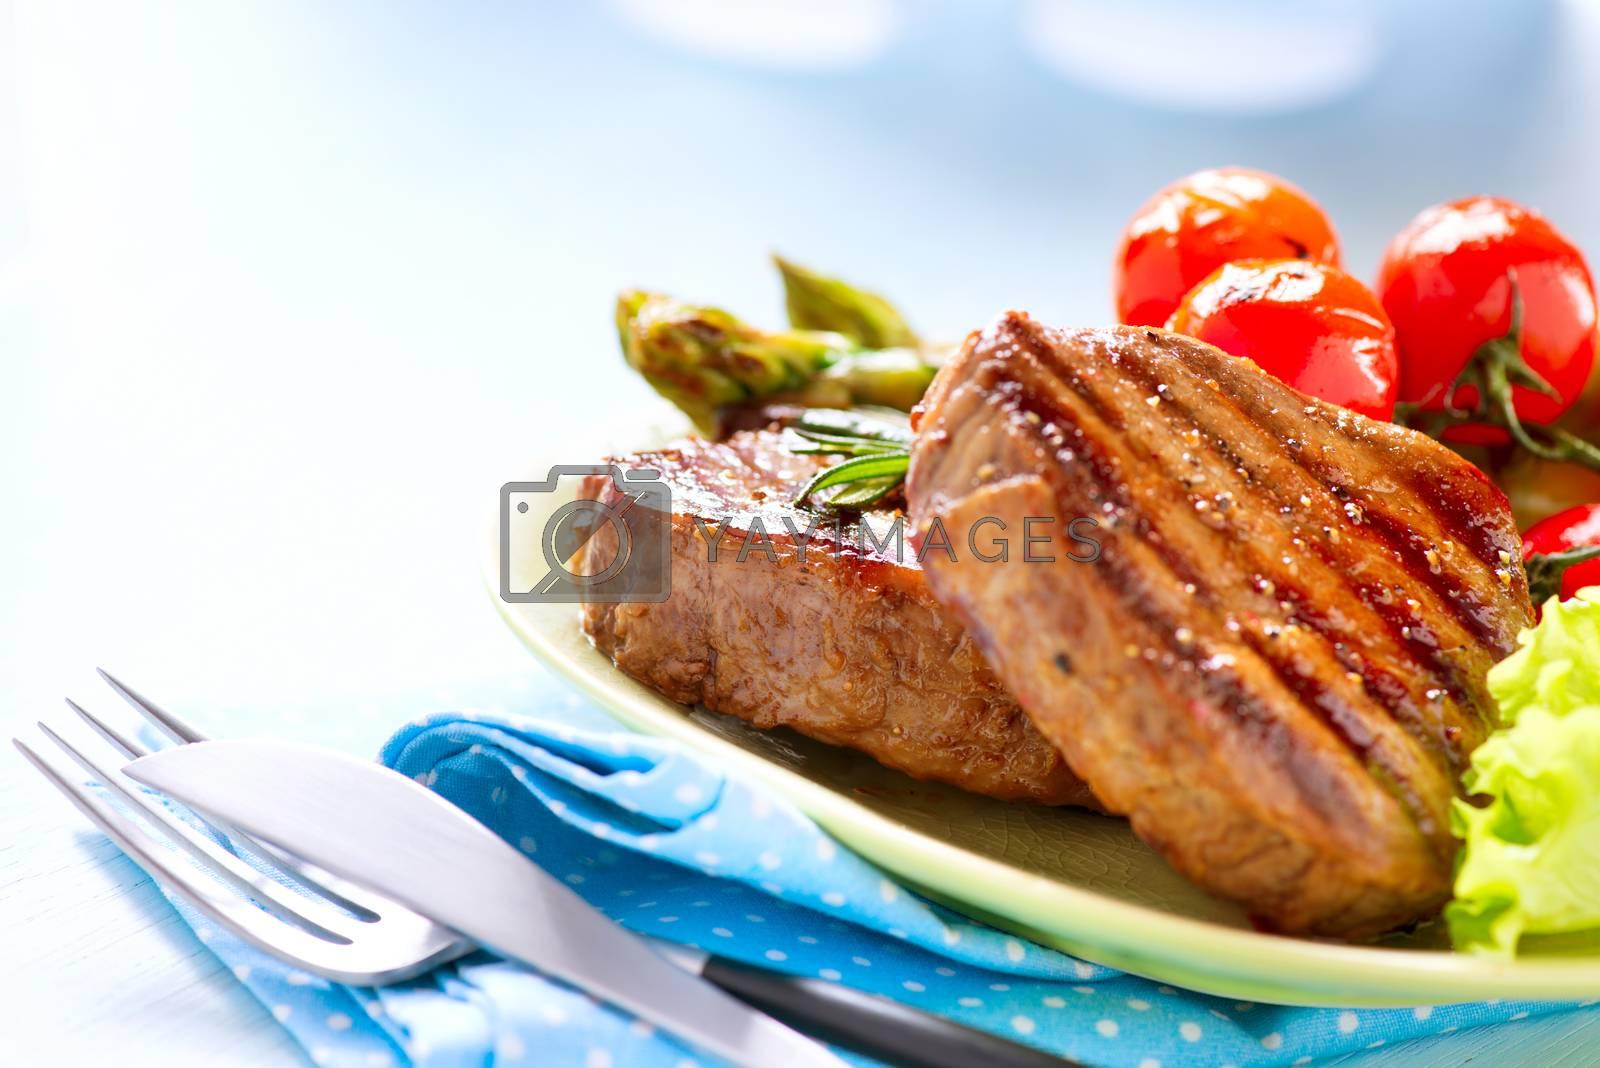 Steak. Grilled Beef Steak Meat with Vegetables